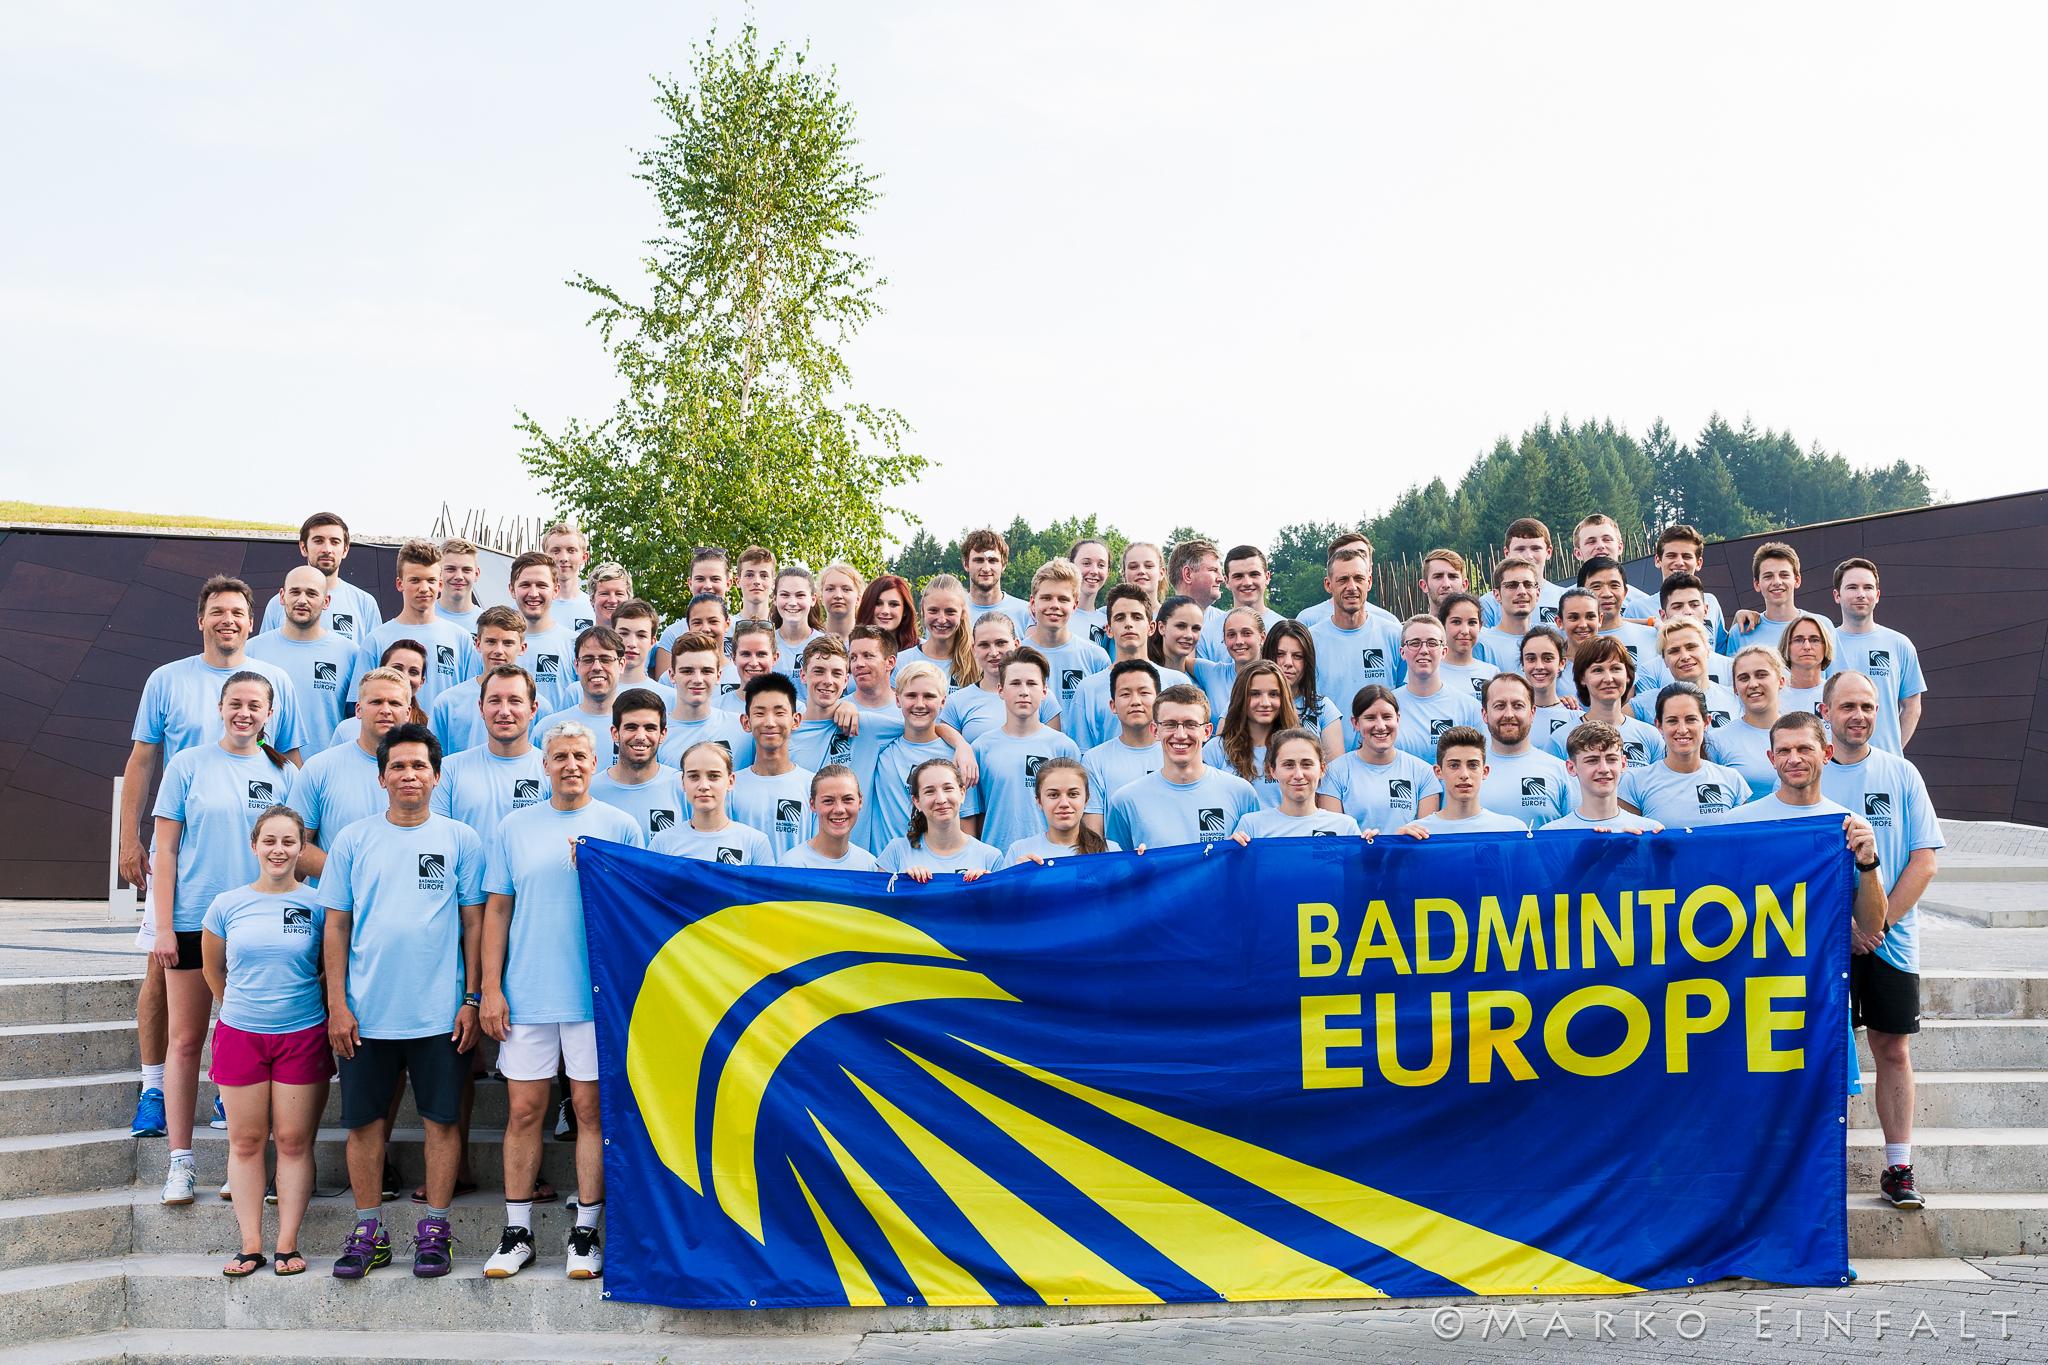 BadmintonEurope.com - Development Badminton Europe